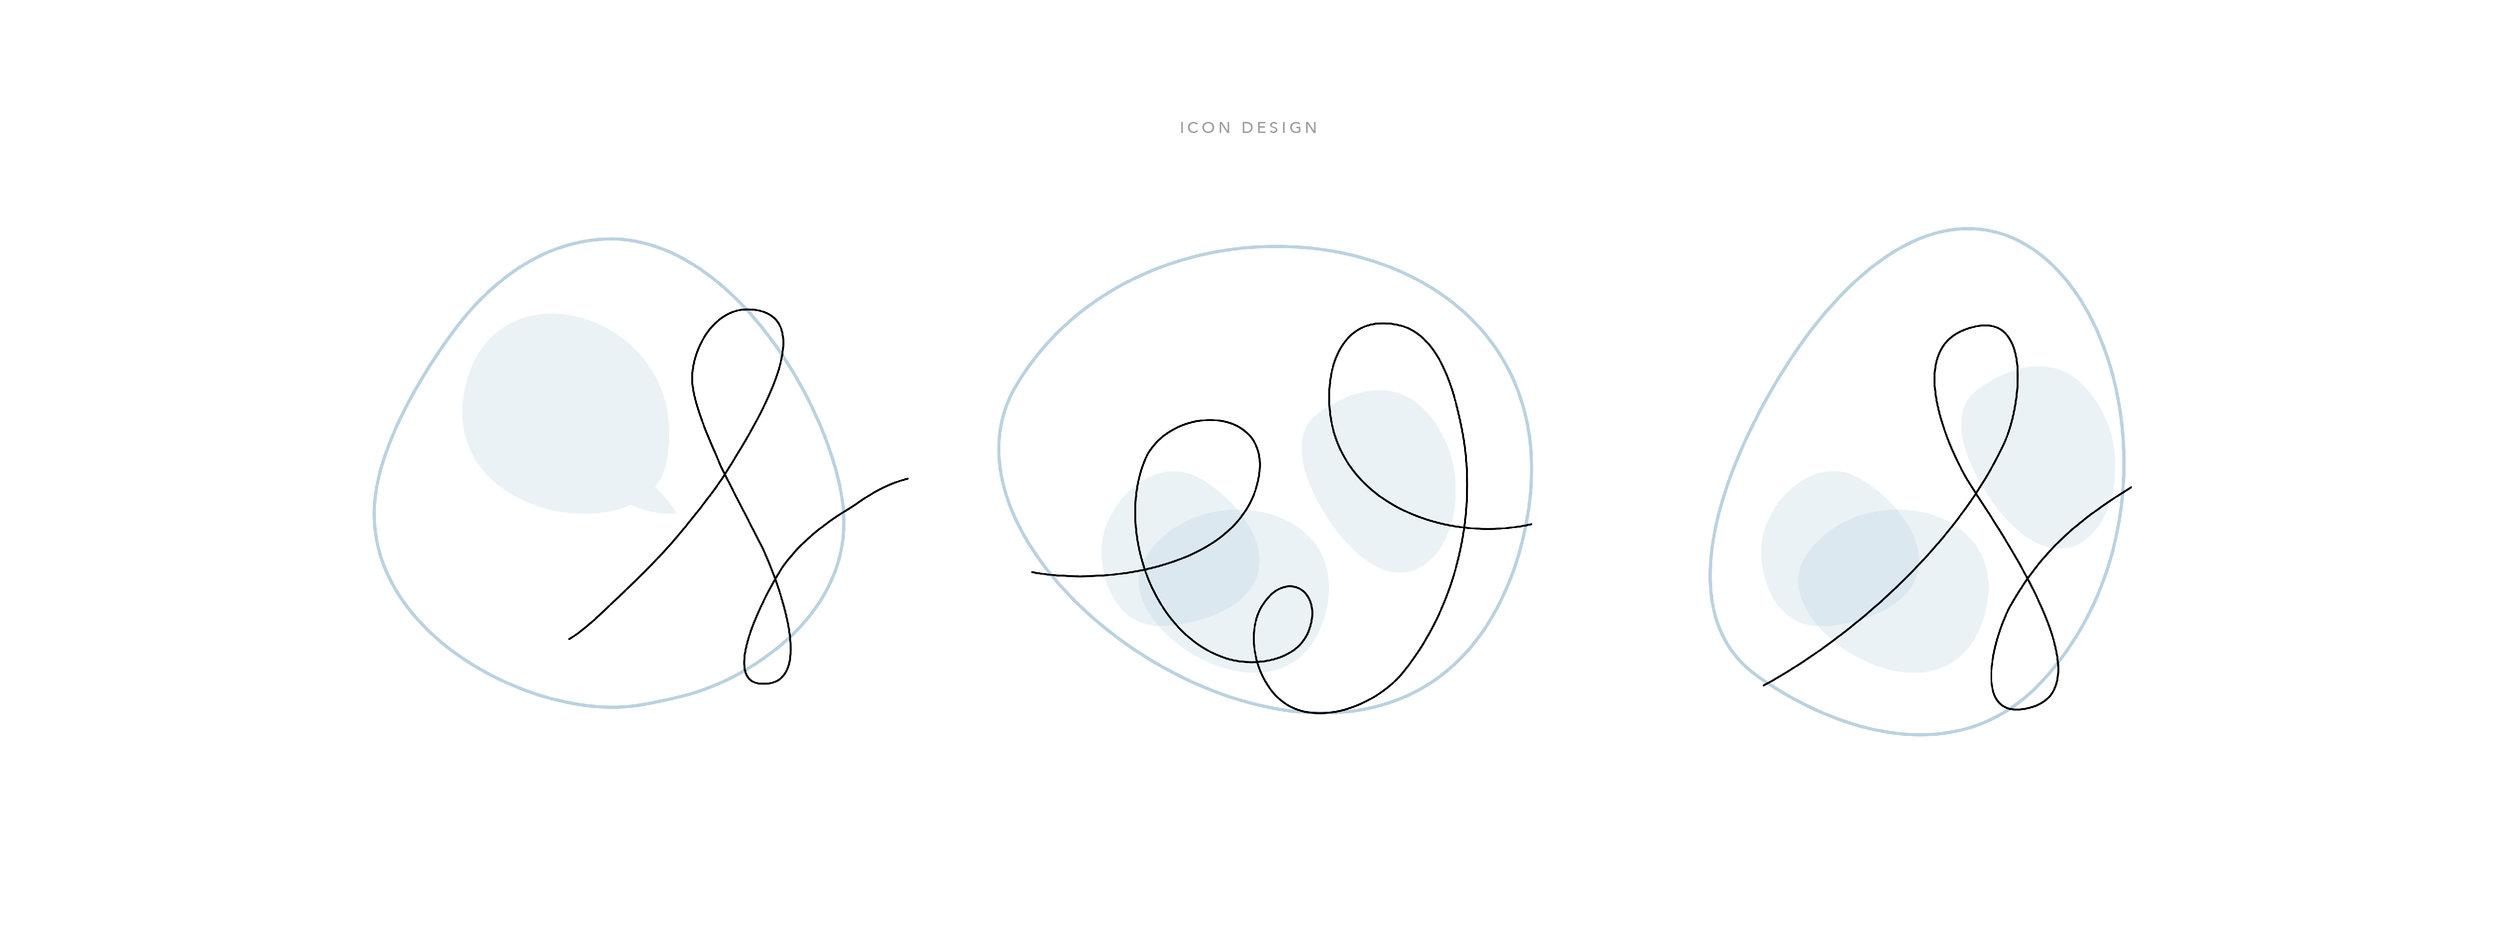 CANOPY_Kelli de la Torre_Branding_Icon Design.jpg